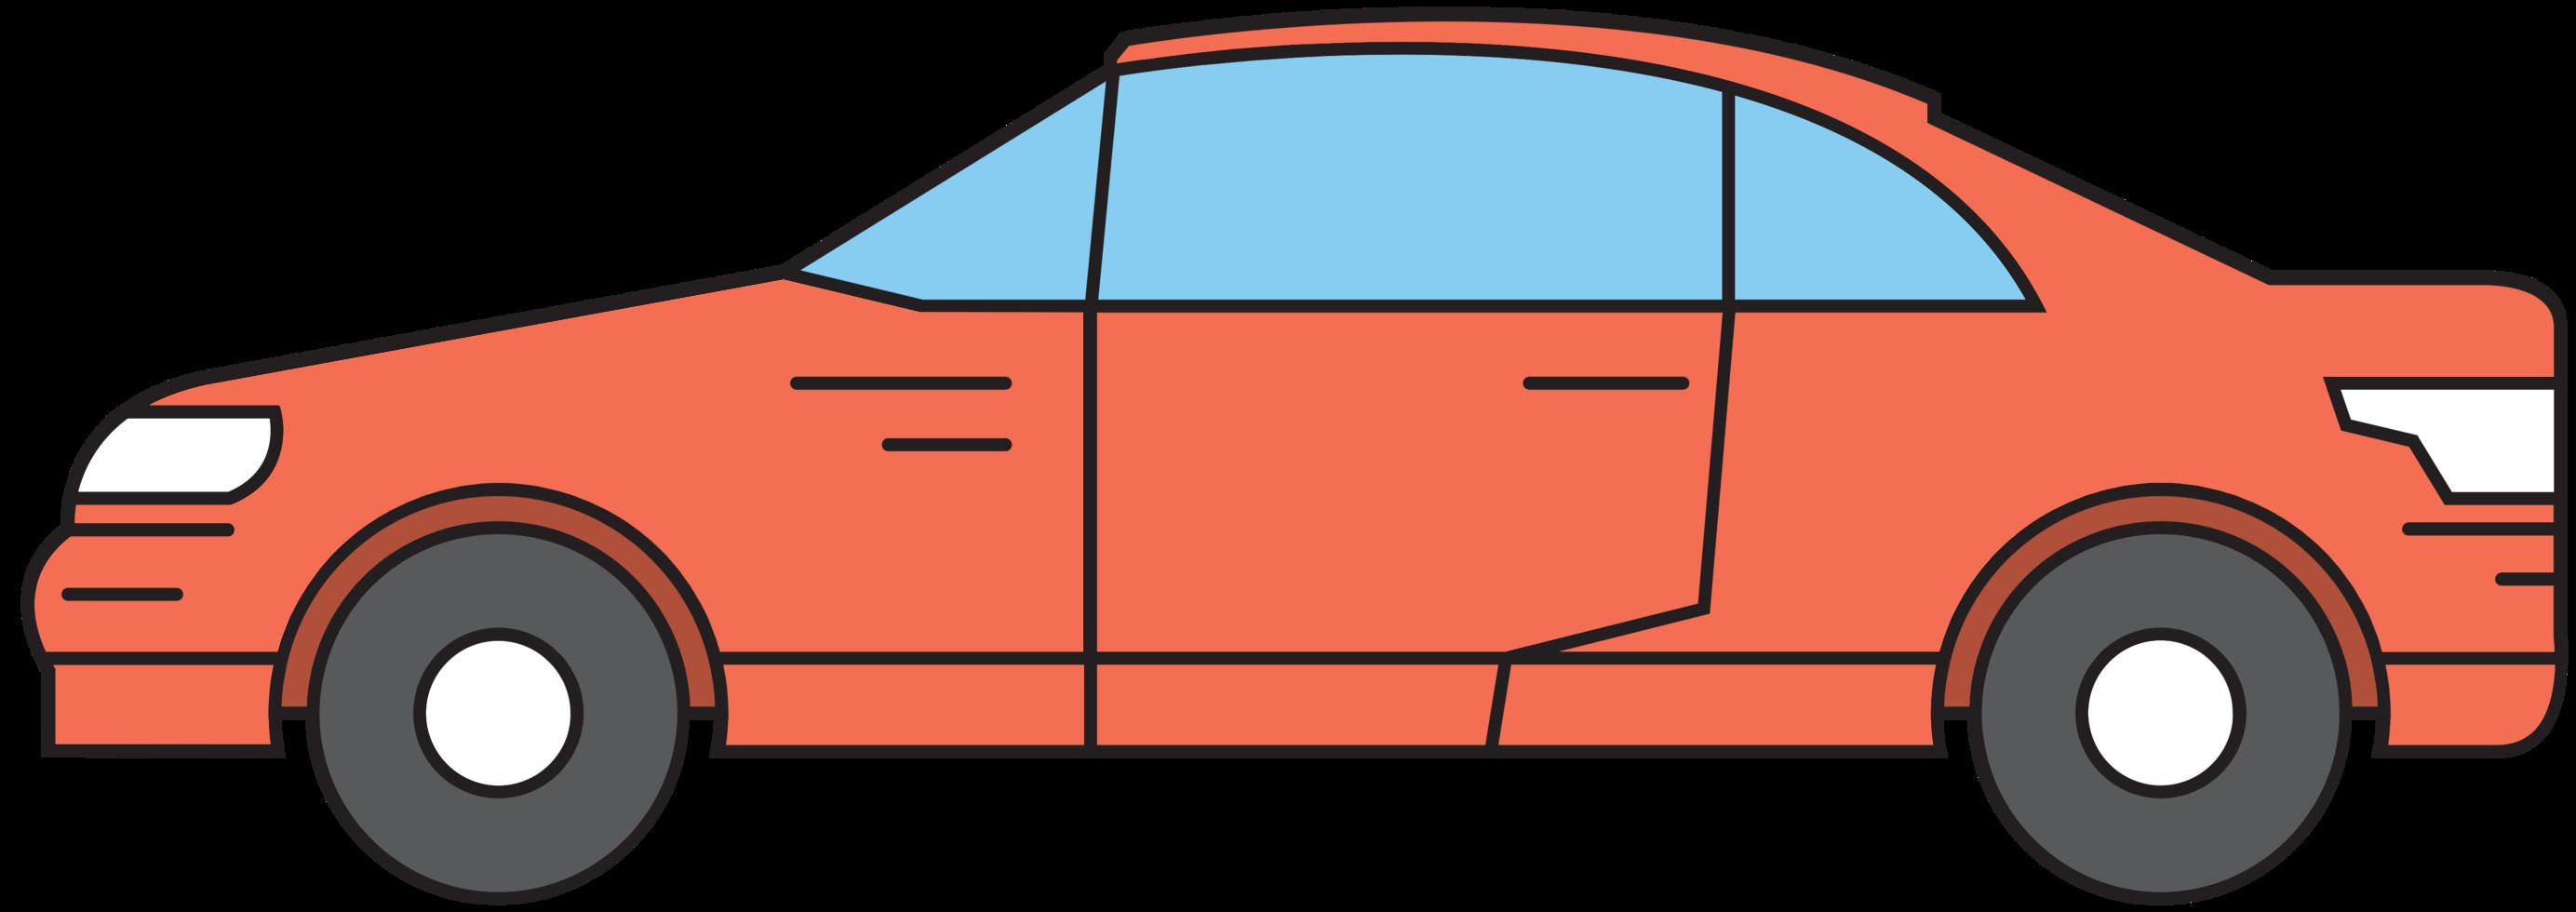 carro sedan png